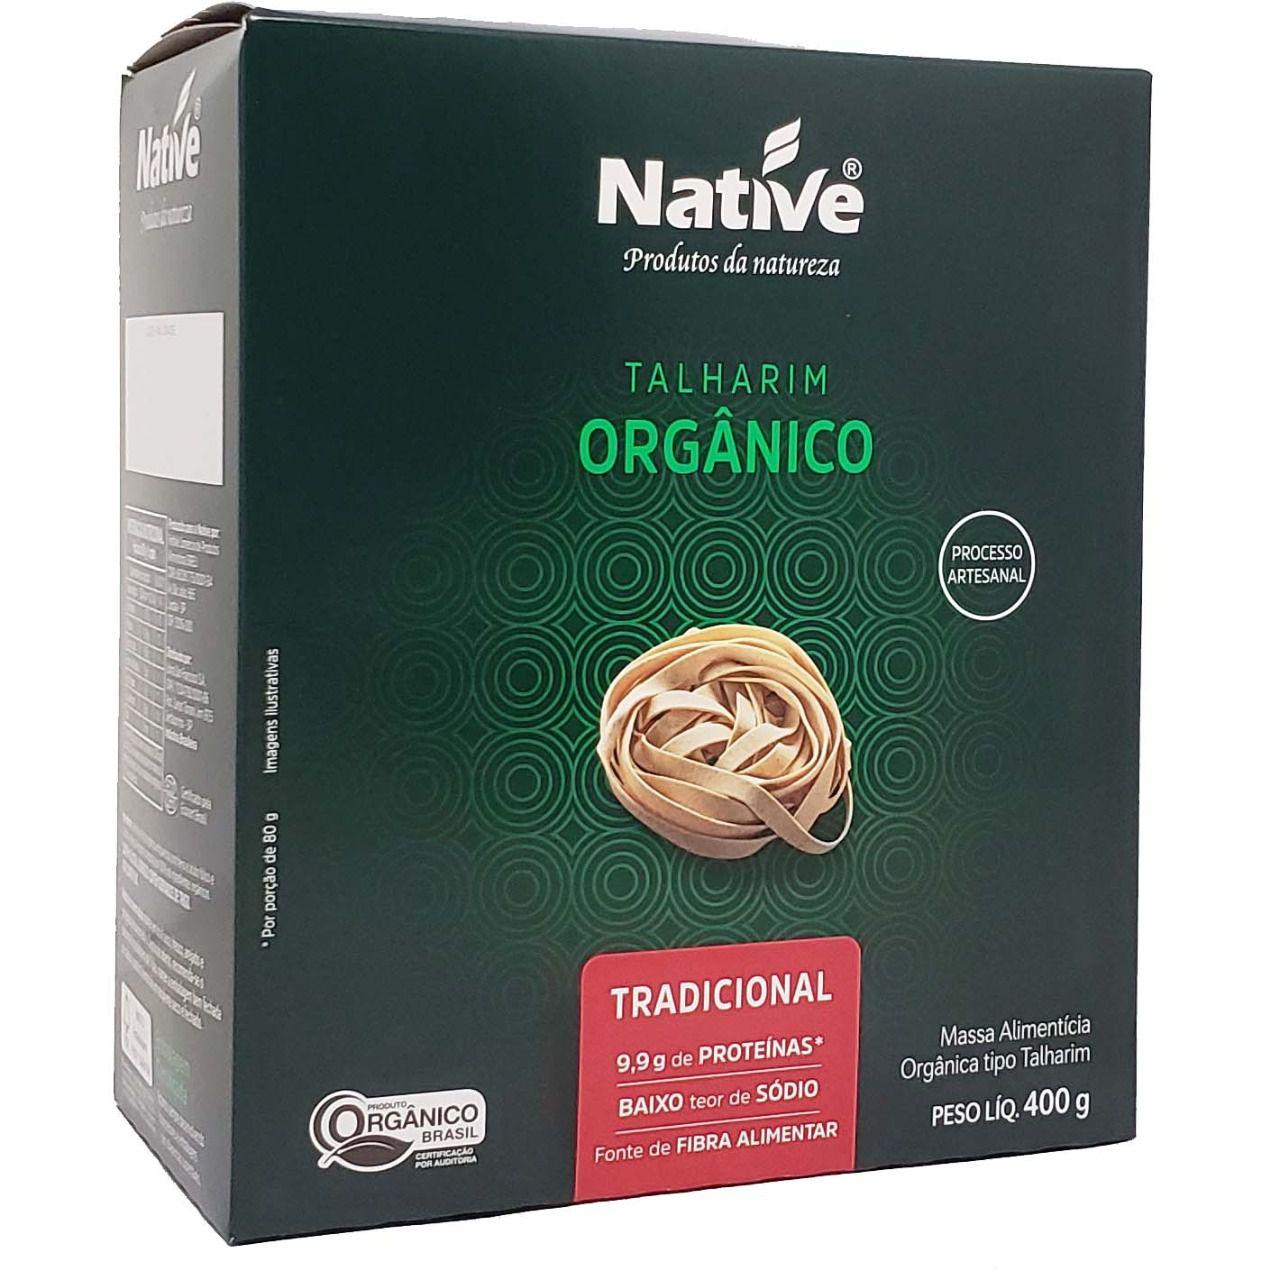 Talharim Orgânico Tradicional Native - 400g -